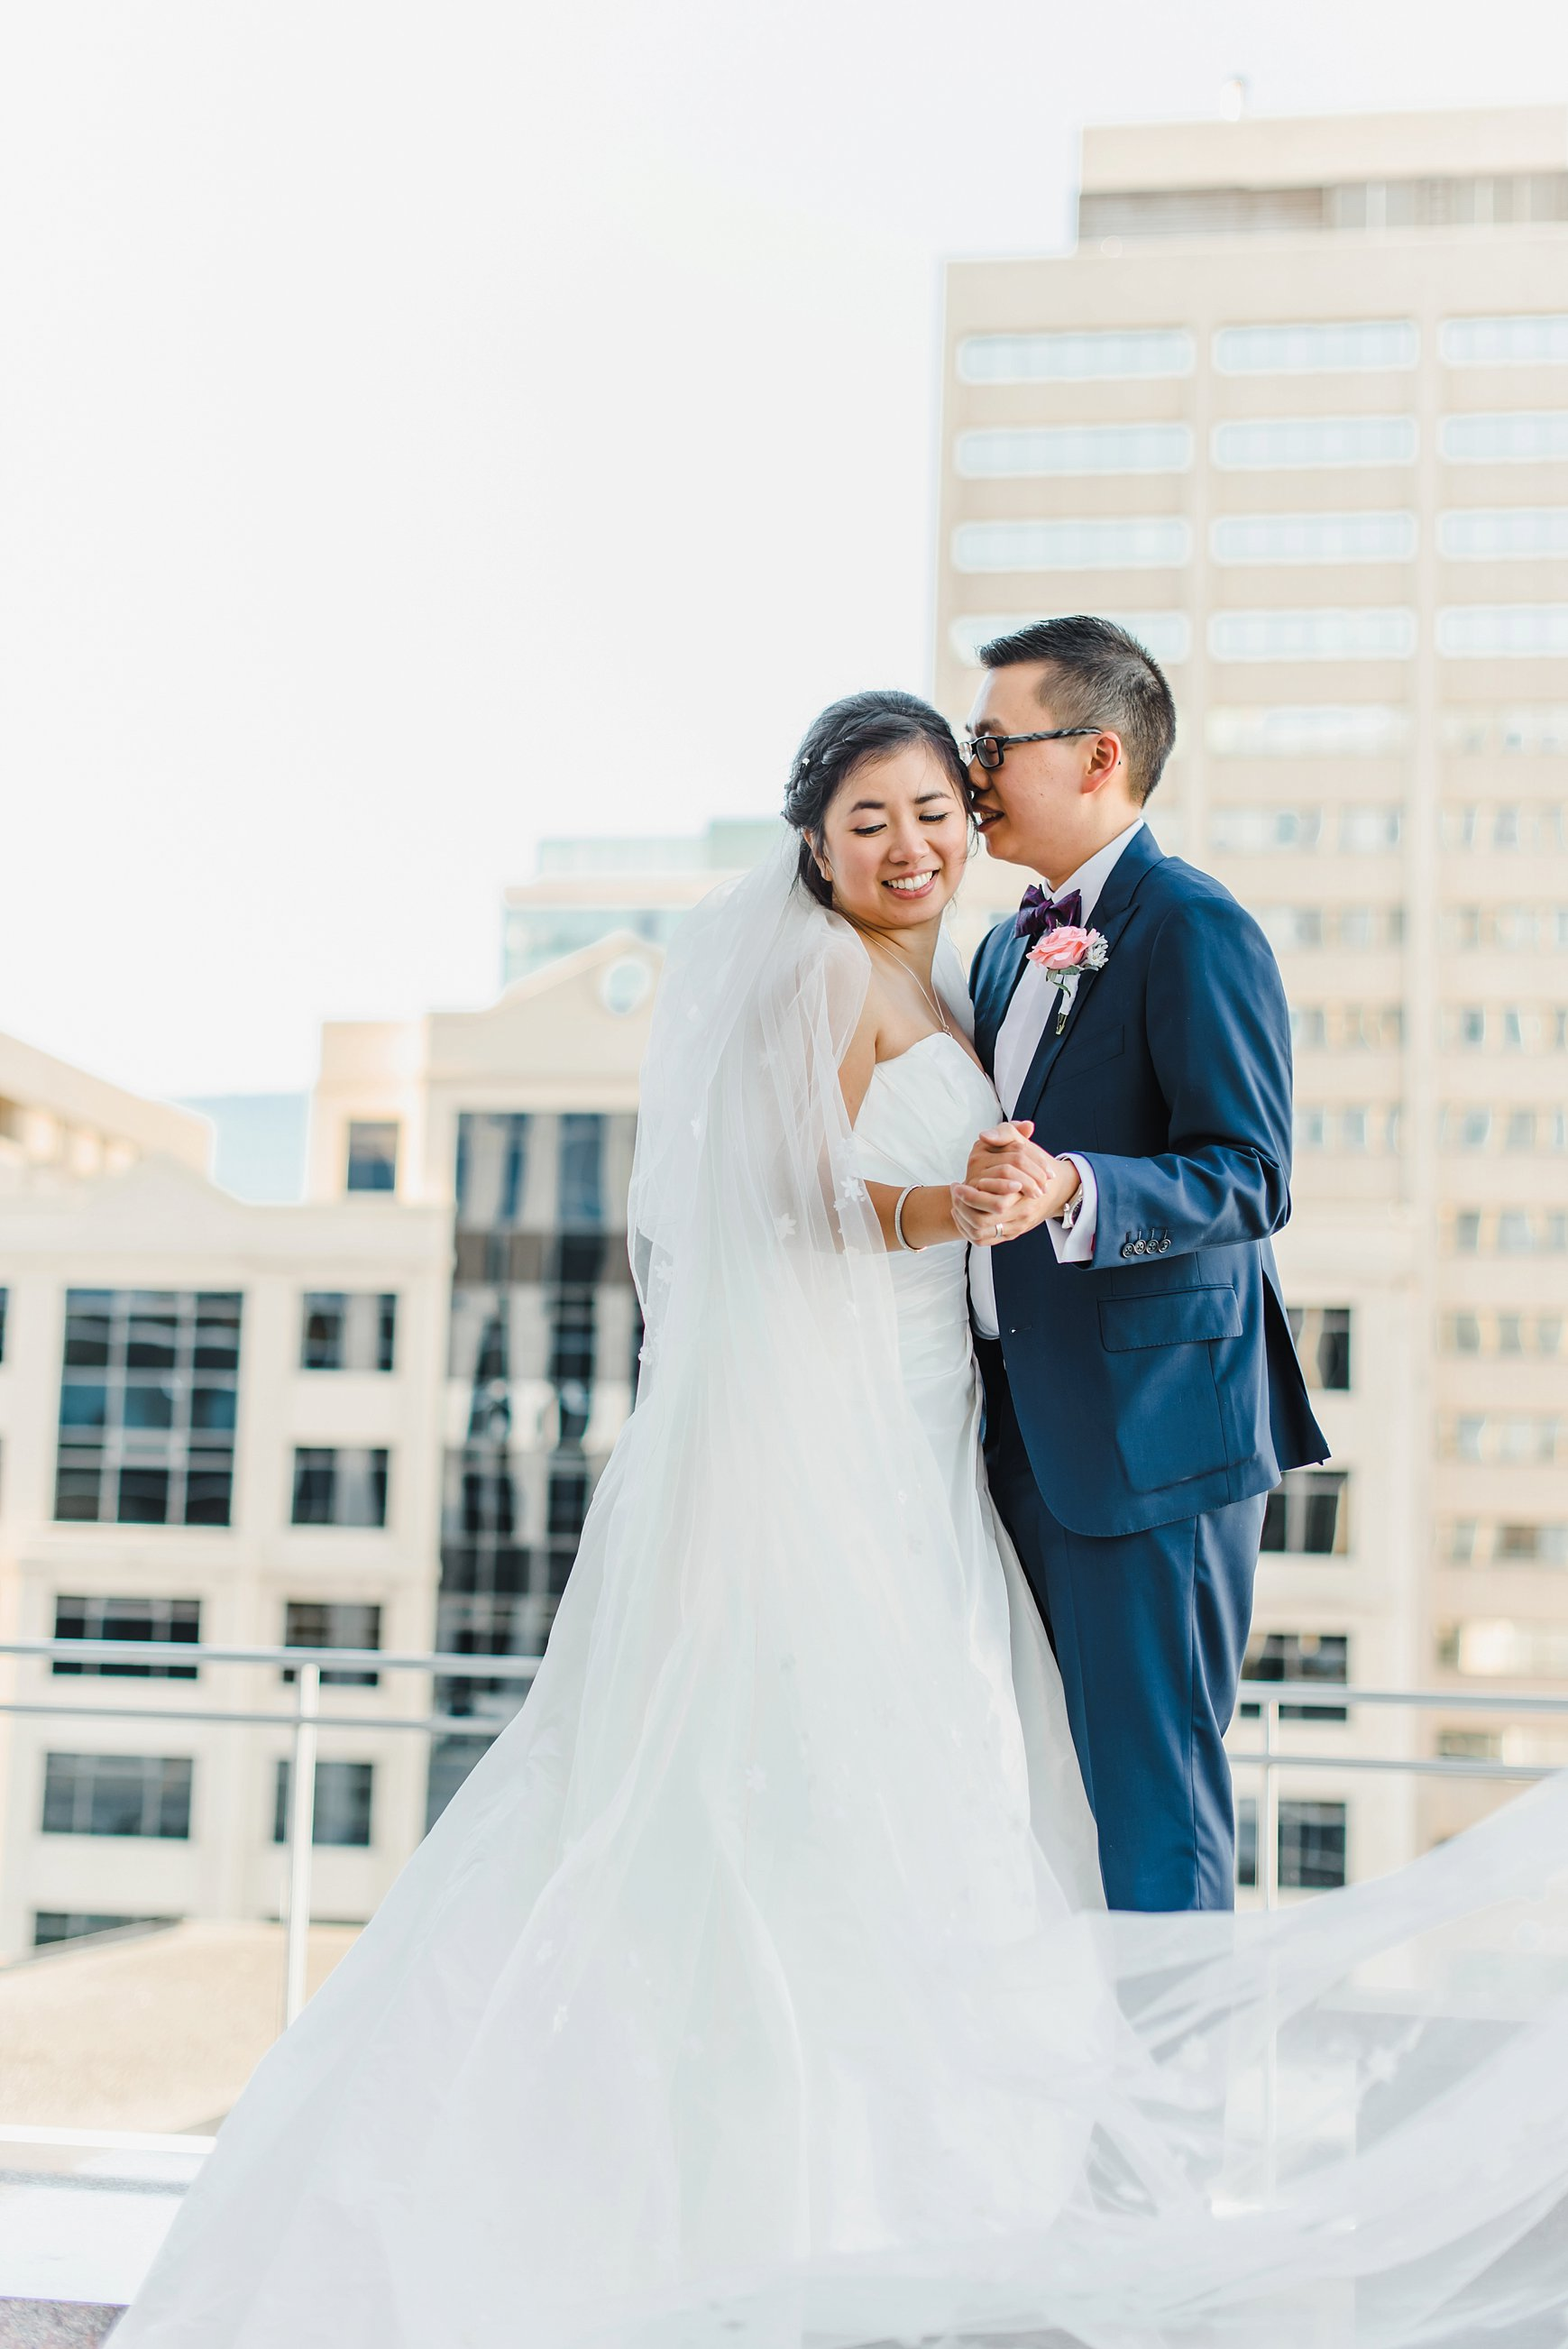 light airy indie fine art ottawa wedding photographer | Ali and Batoul Photography_1528.jpg